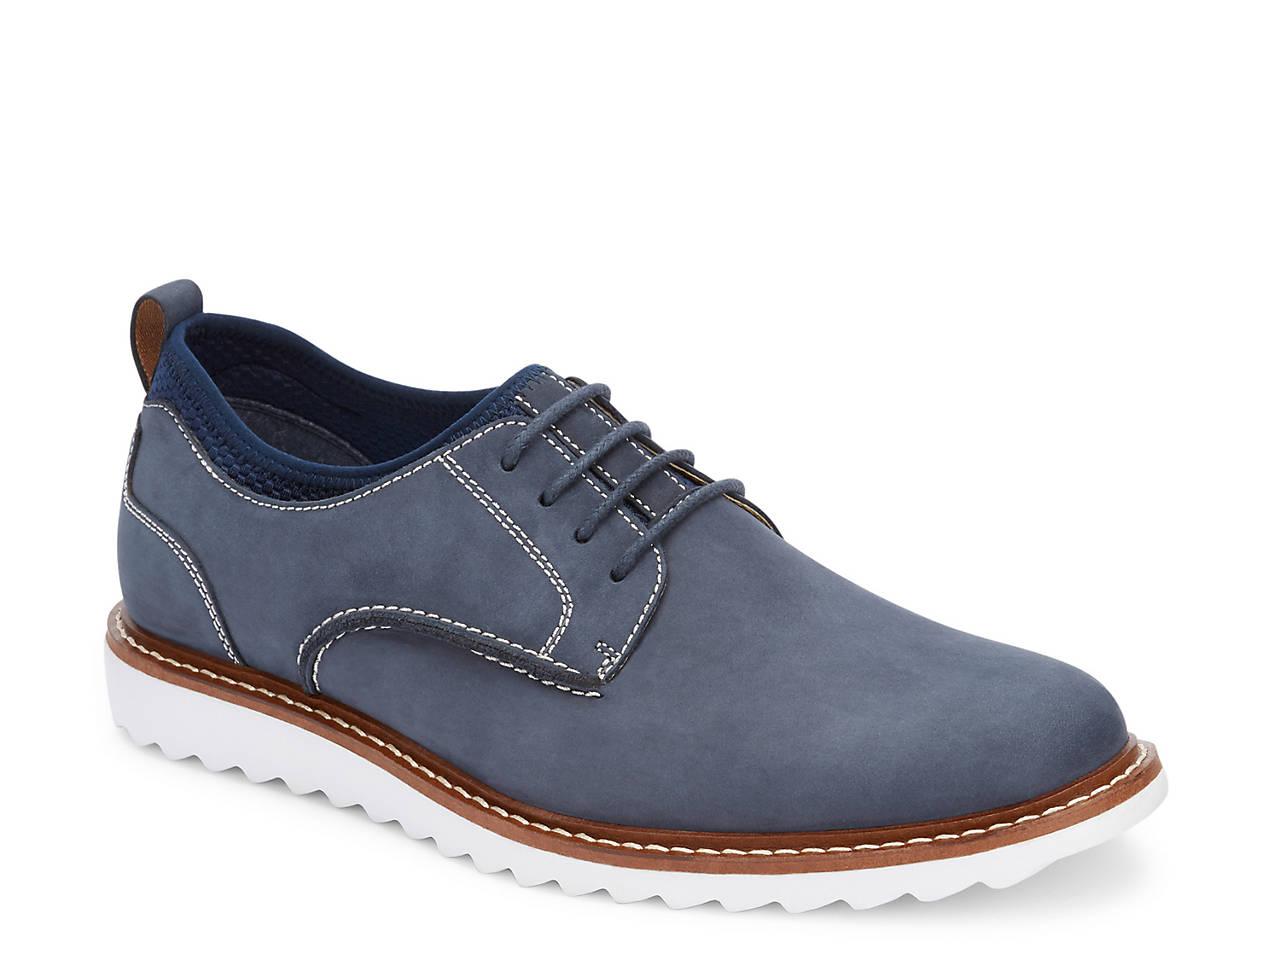 cb9ff37f37ed G.H. Bass   Co. Dirty Buck 2.0 Oxford Men s Shoes